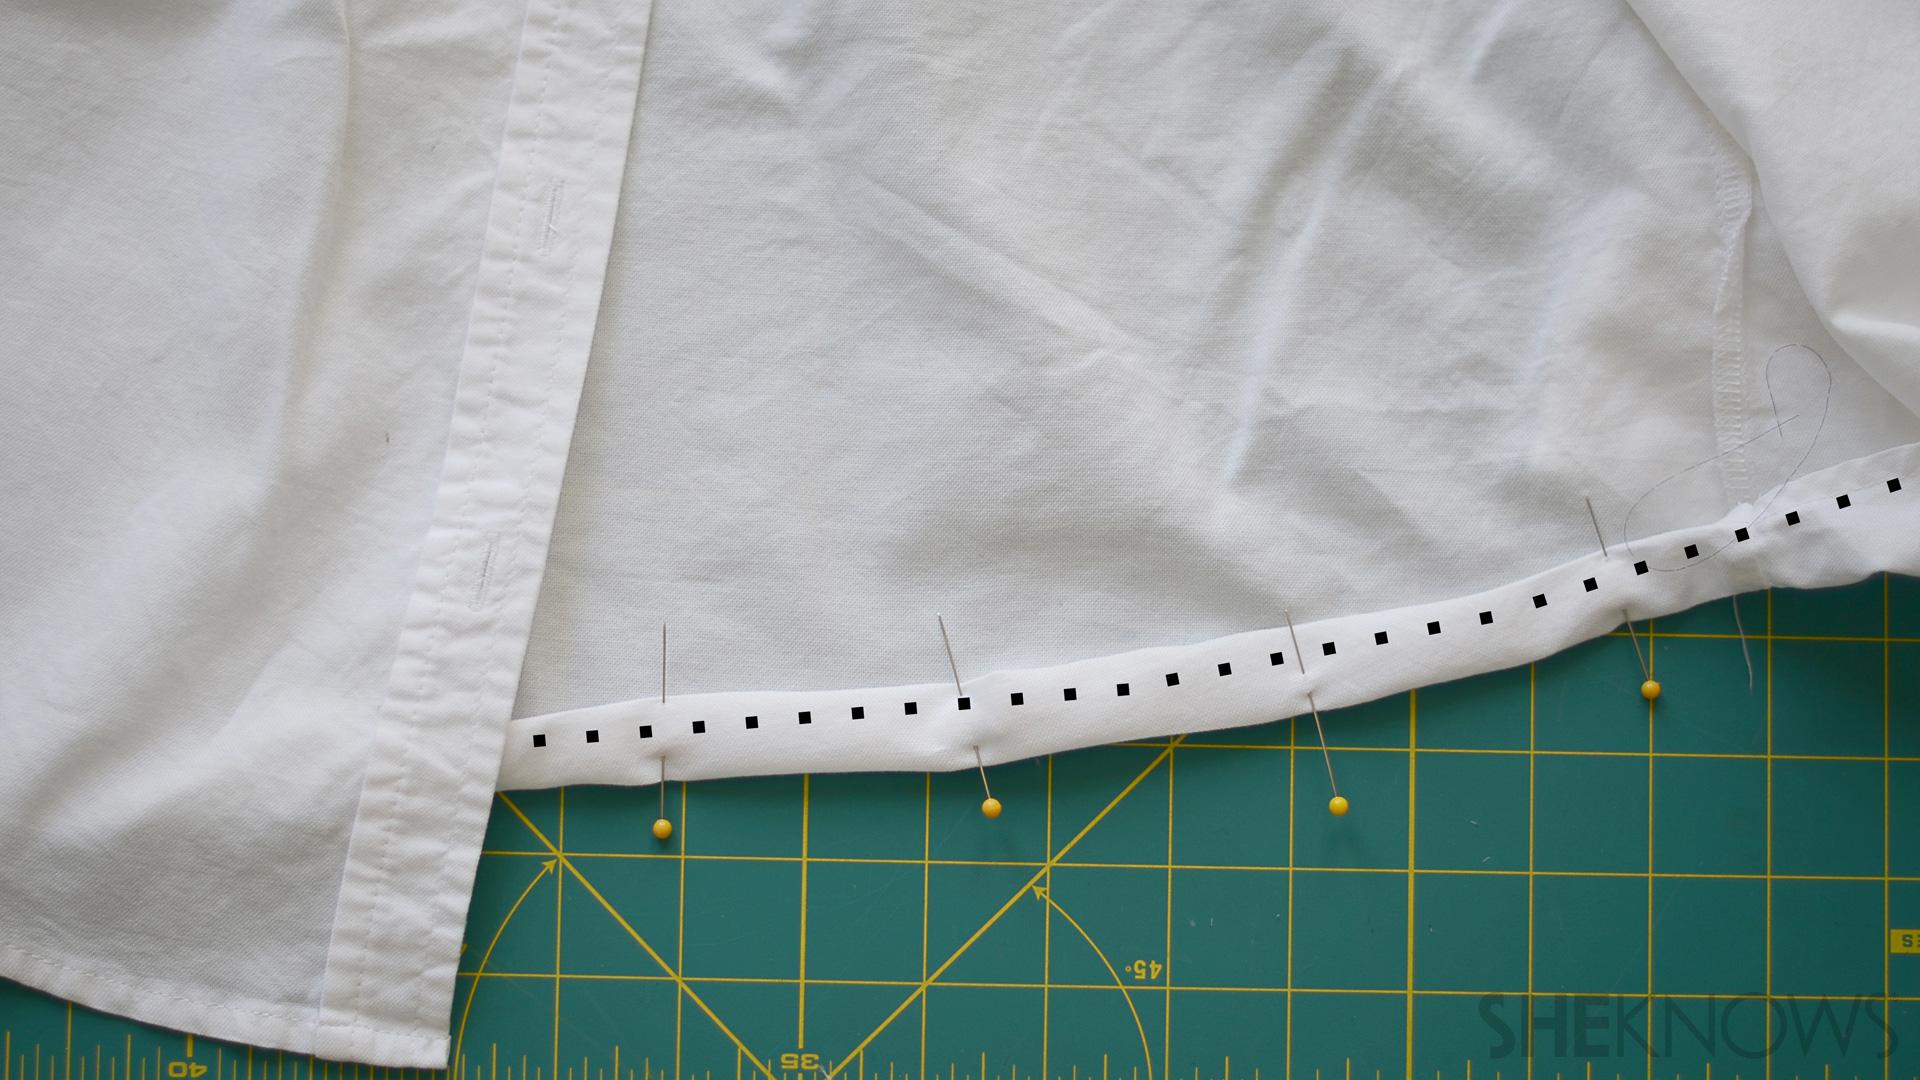 Hemmed edge of a shirt pinned down